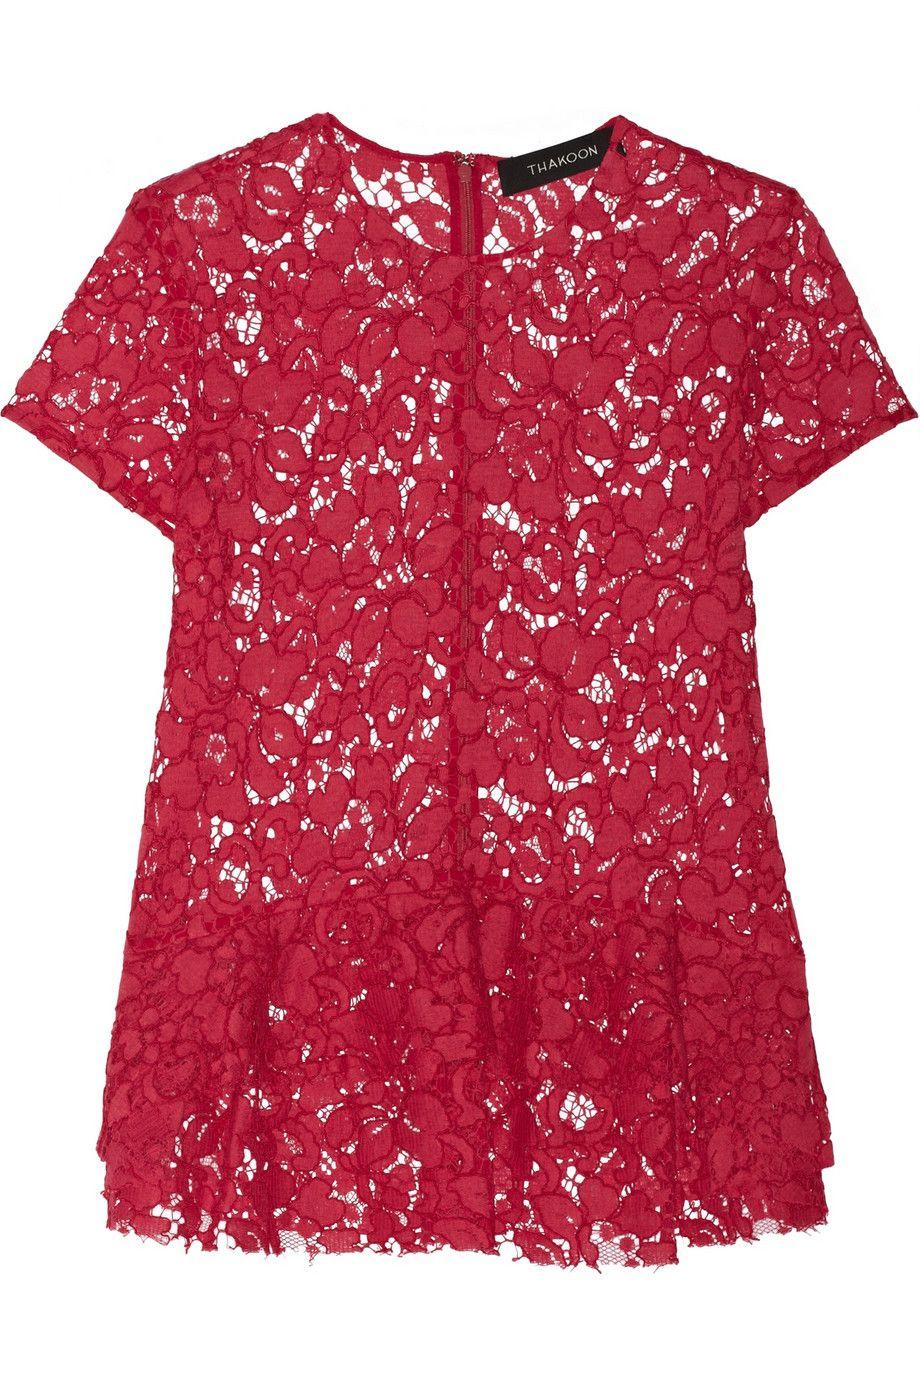 Thakoon|Embroidered cotton-blend lace peplum top|NET-A-PORTER.COM